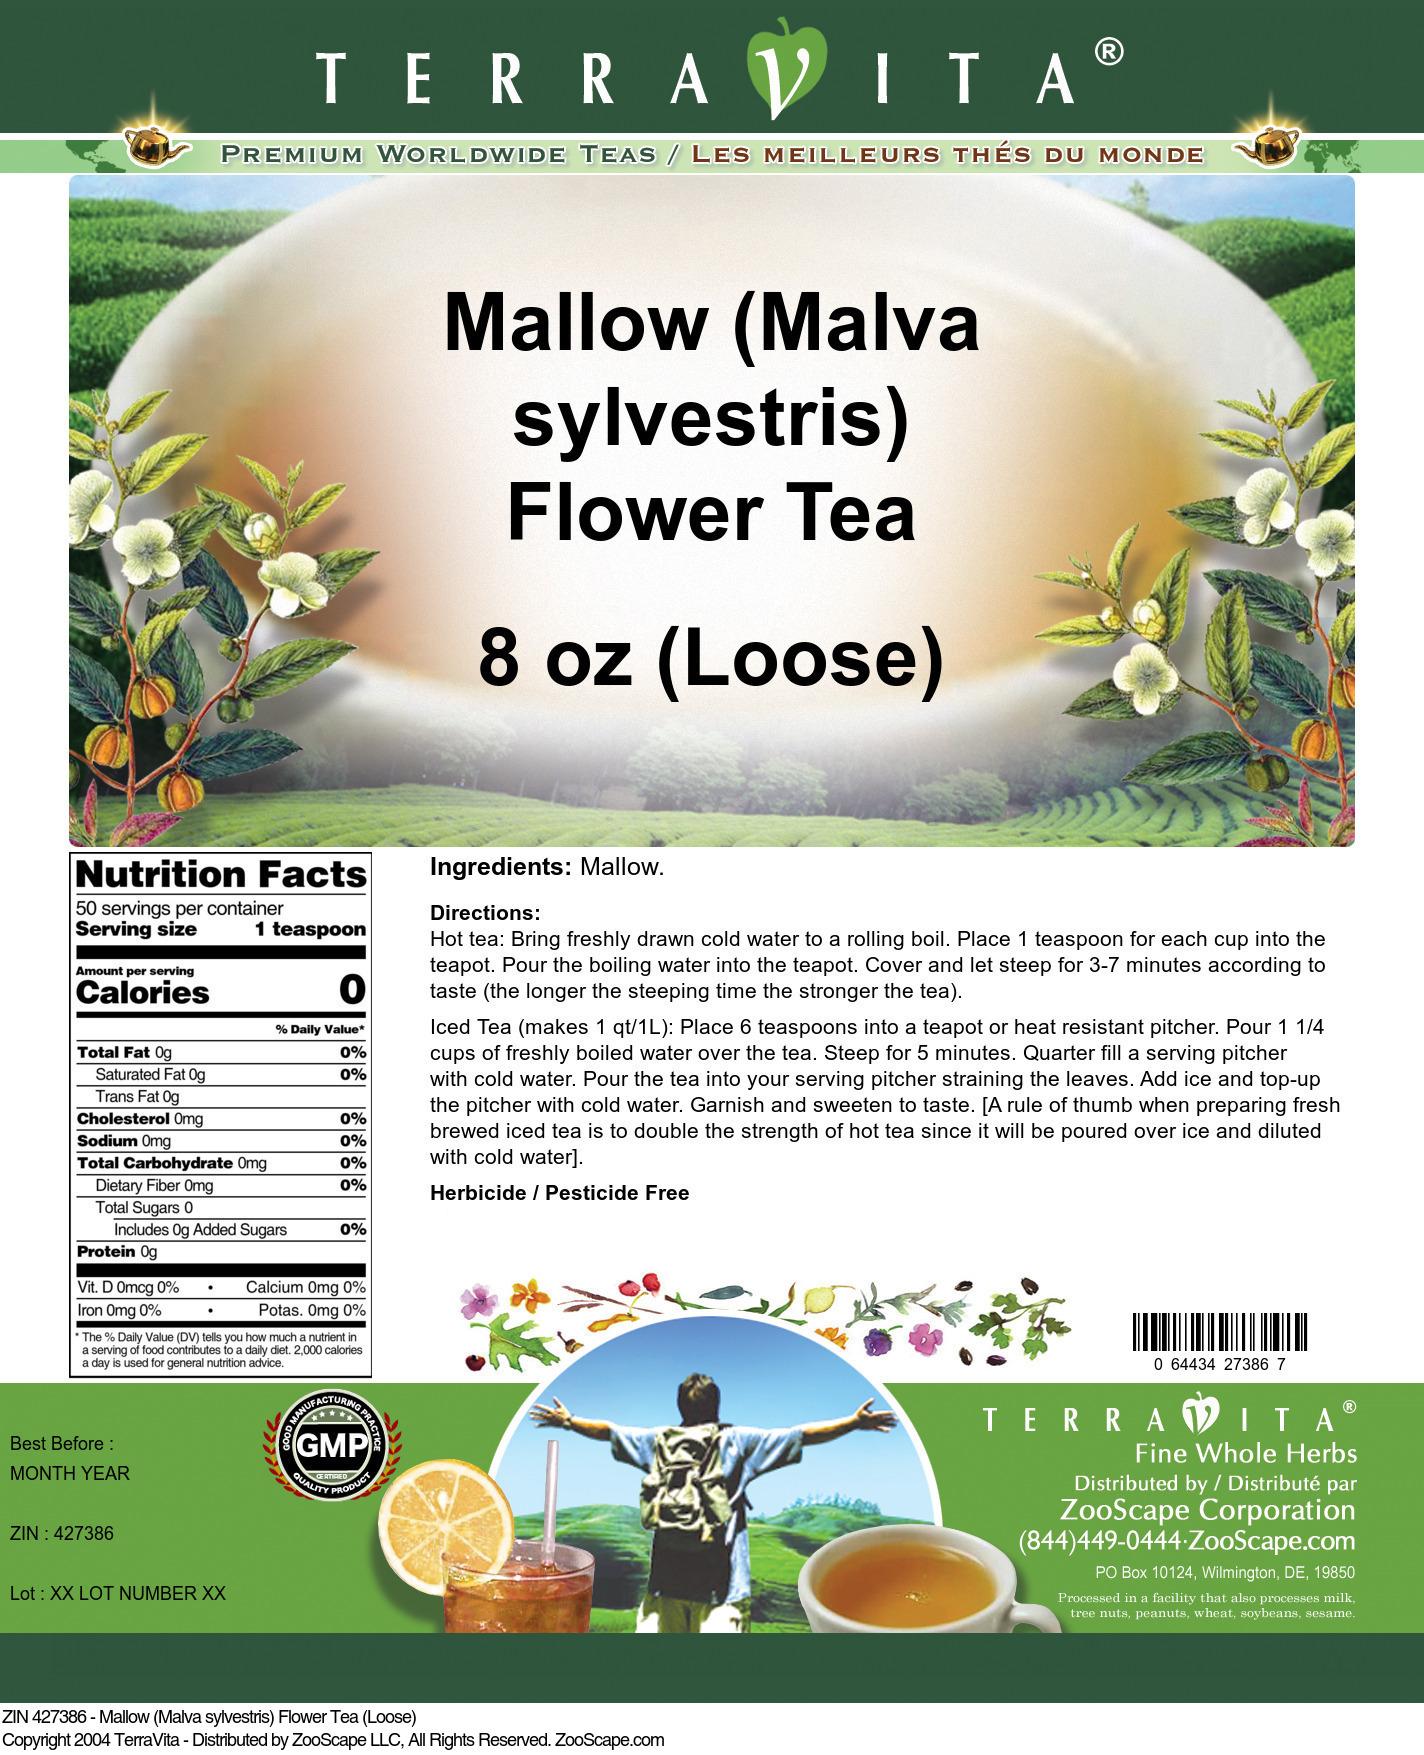 Mallow <BR>(Malva sylvestris) Leaf